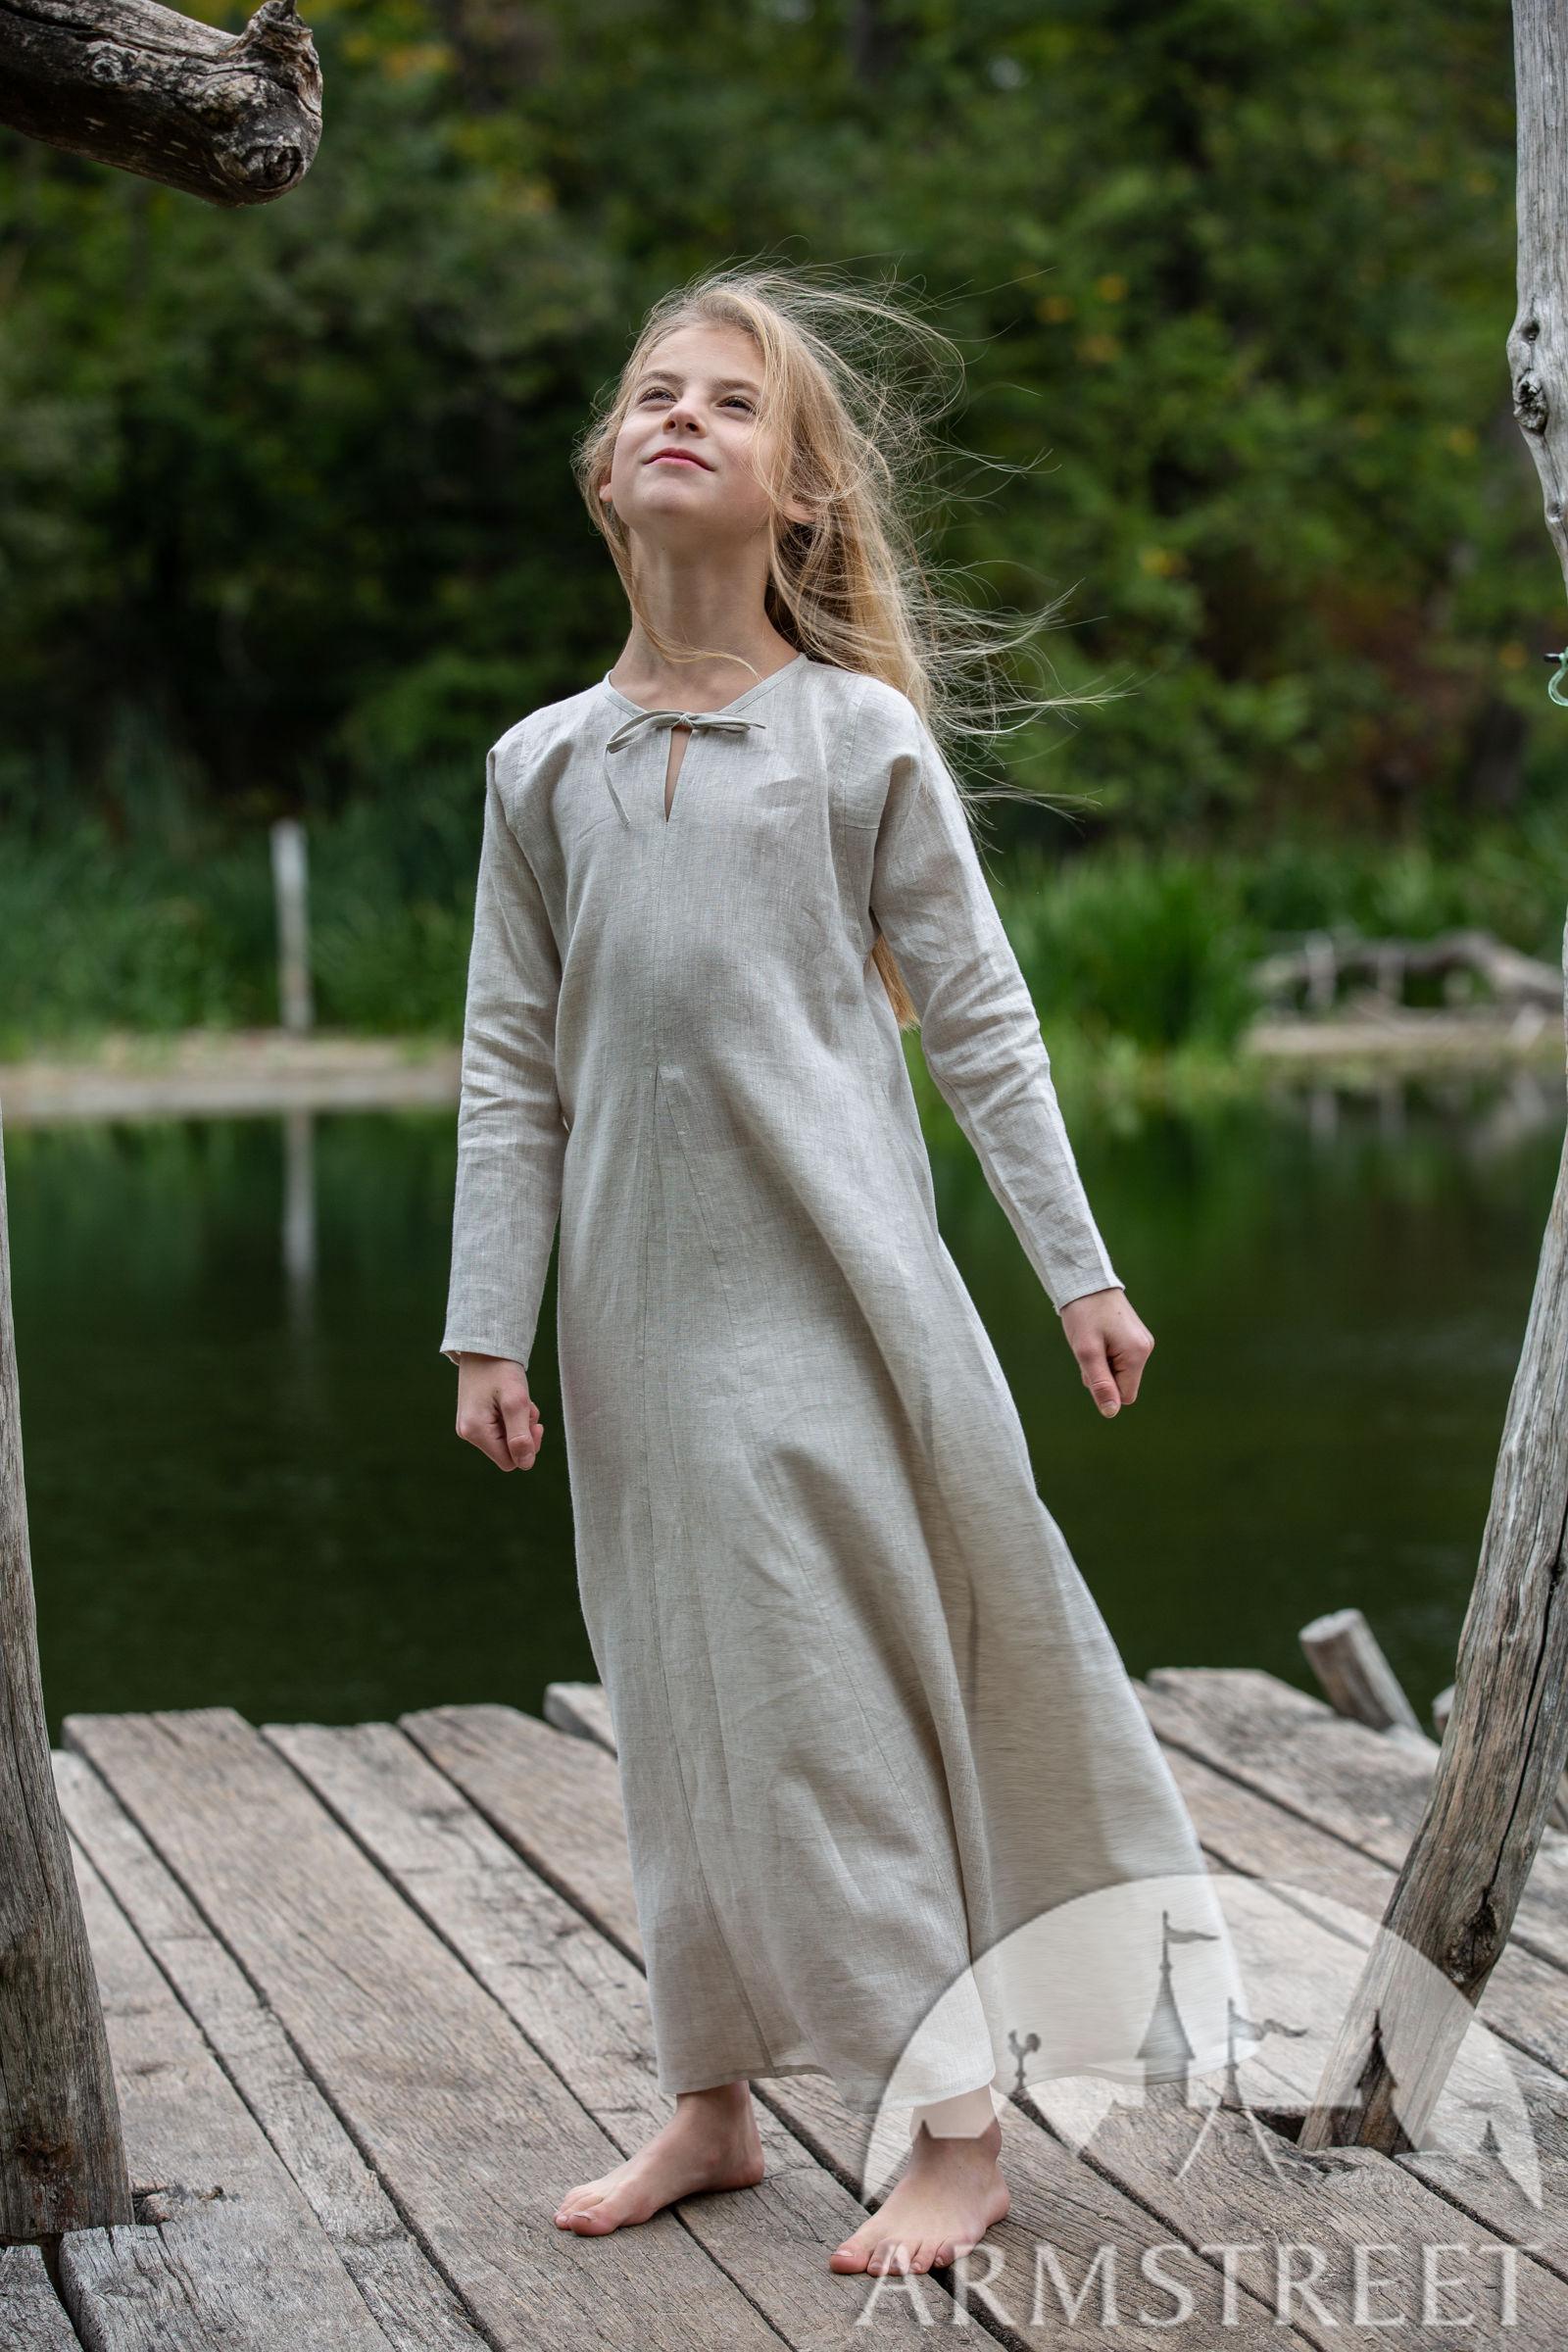 https://armstreet.com/catalogue/full/long-linen-underdress-chemise-for-kids-first-adventure.jpg